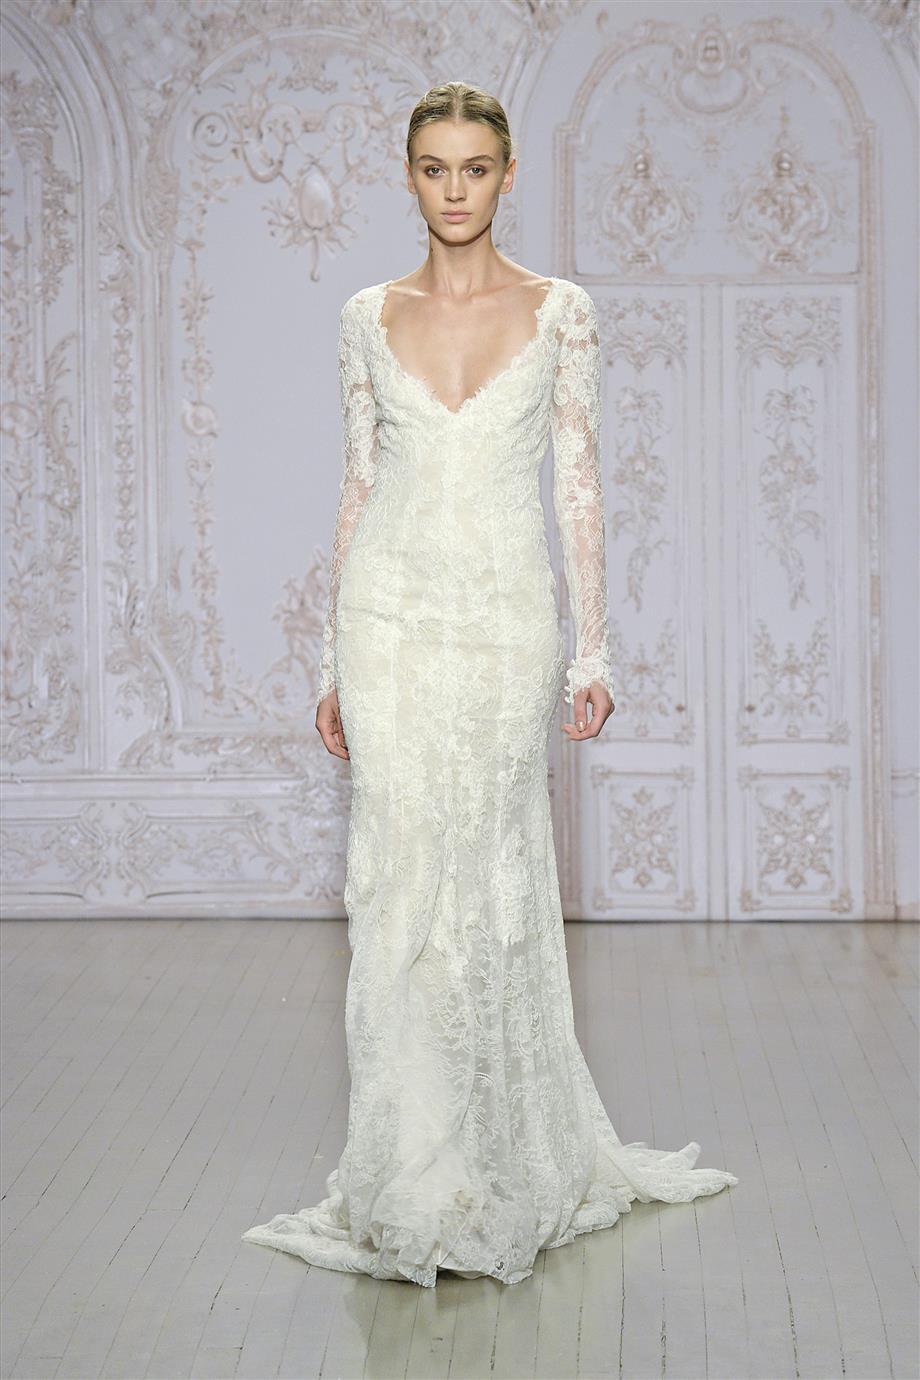 long sleeve wedding dresses sleeved wedding dress Monique Lhuillier Collection Long Sleeved Wedding Dress Autumn